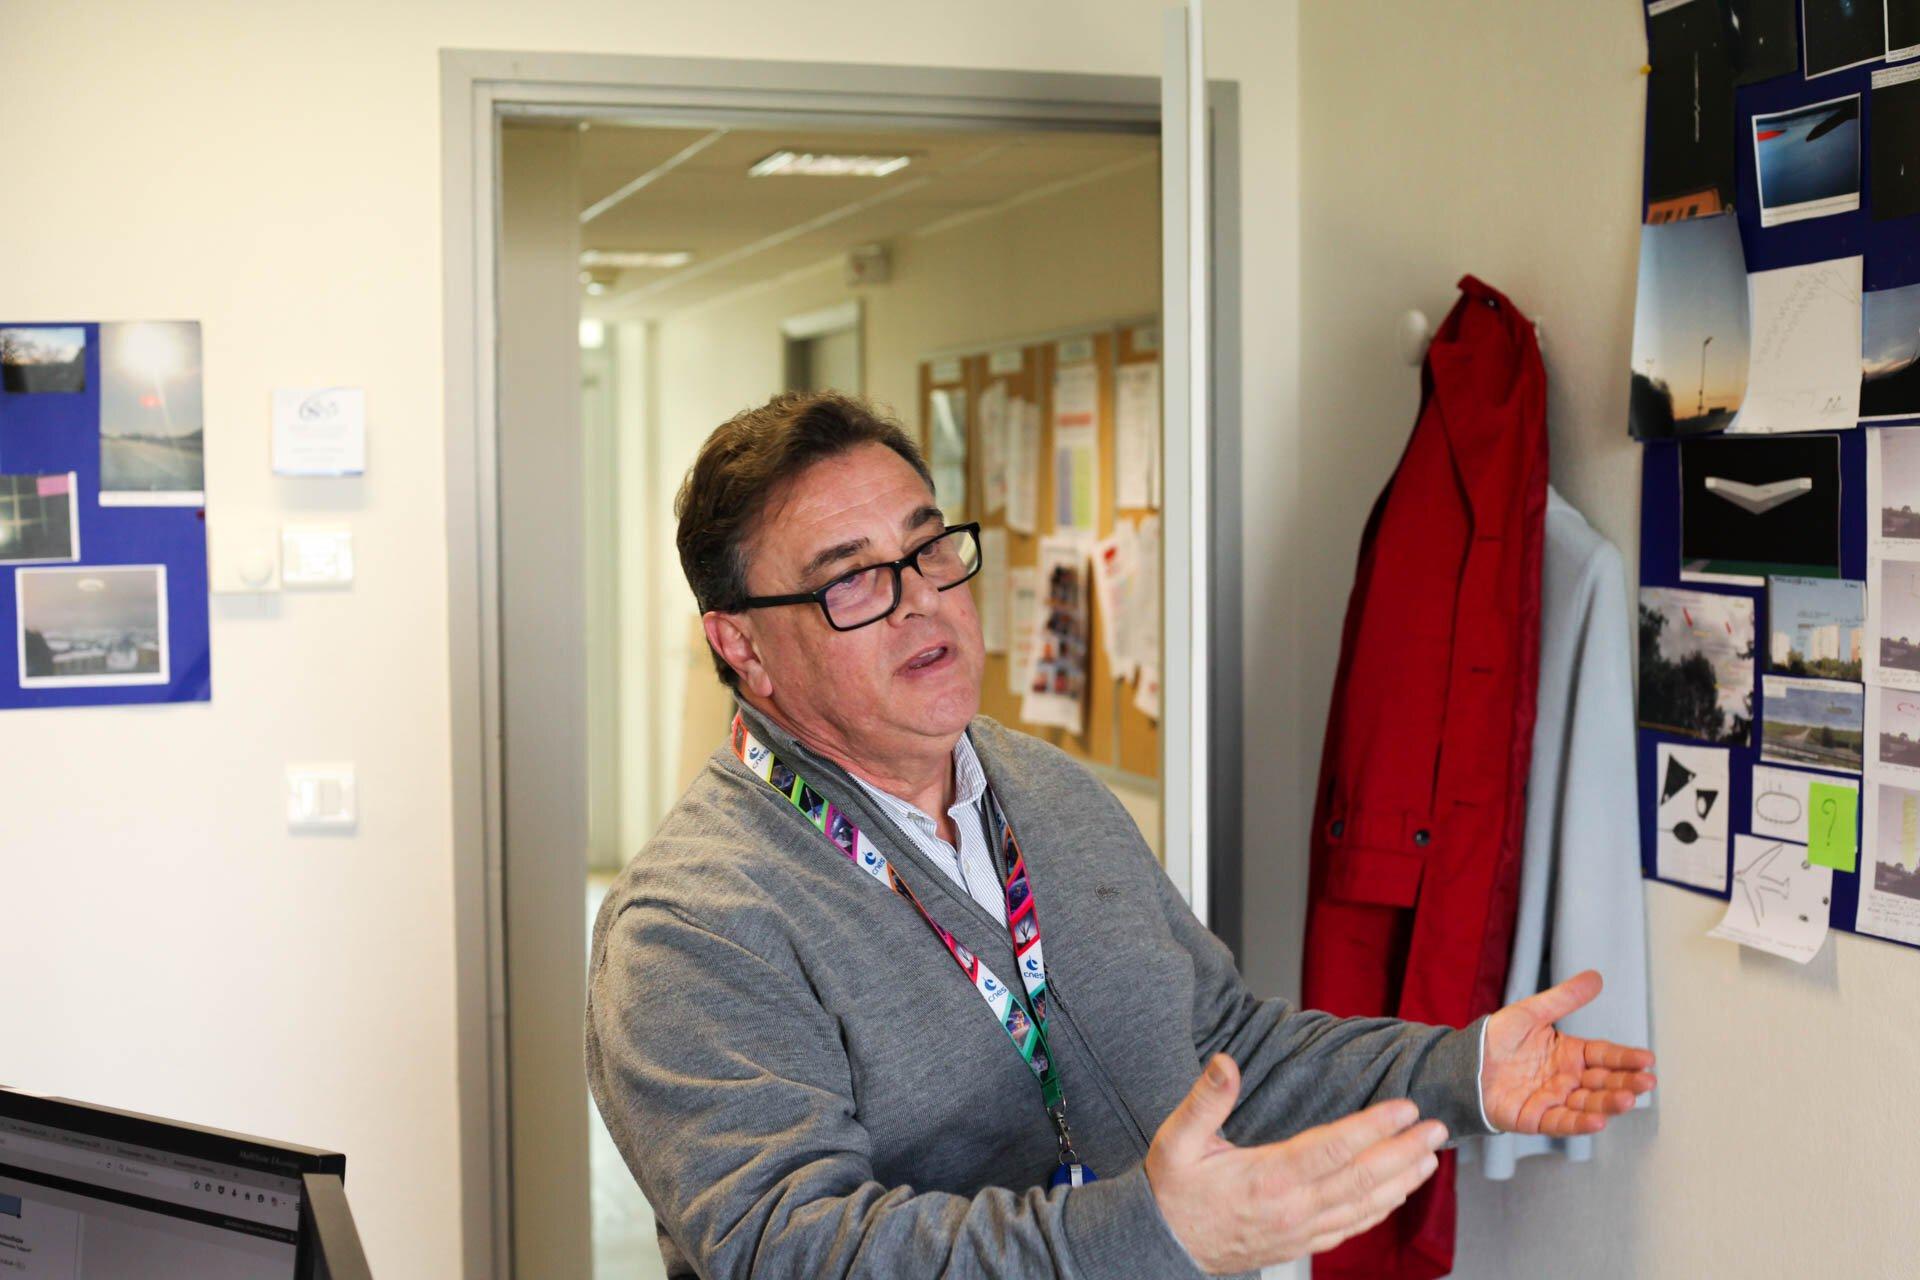 Roger Baldacchino, responsable du Geipan, dans son bureau.